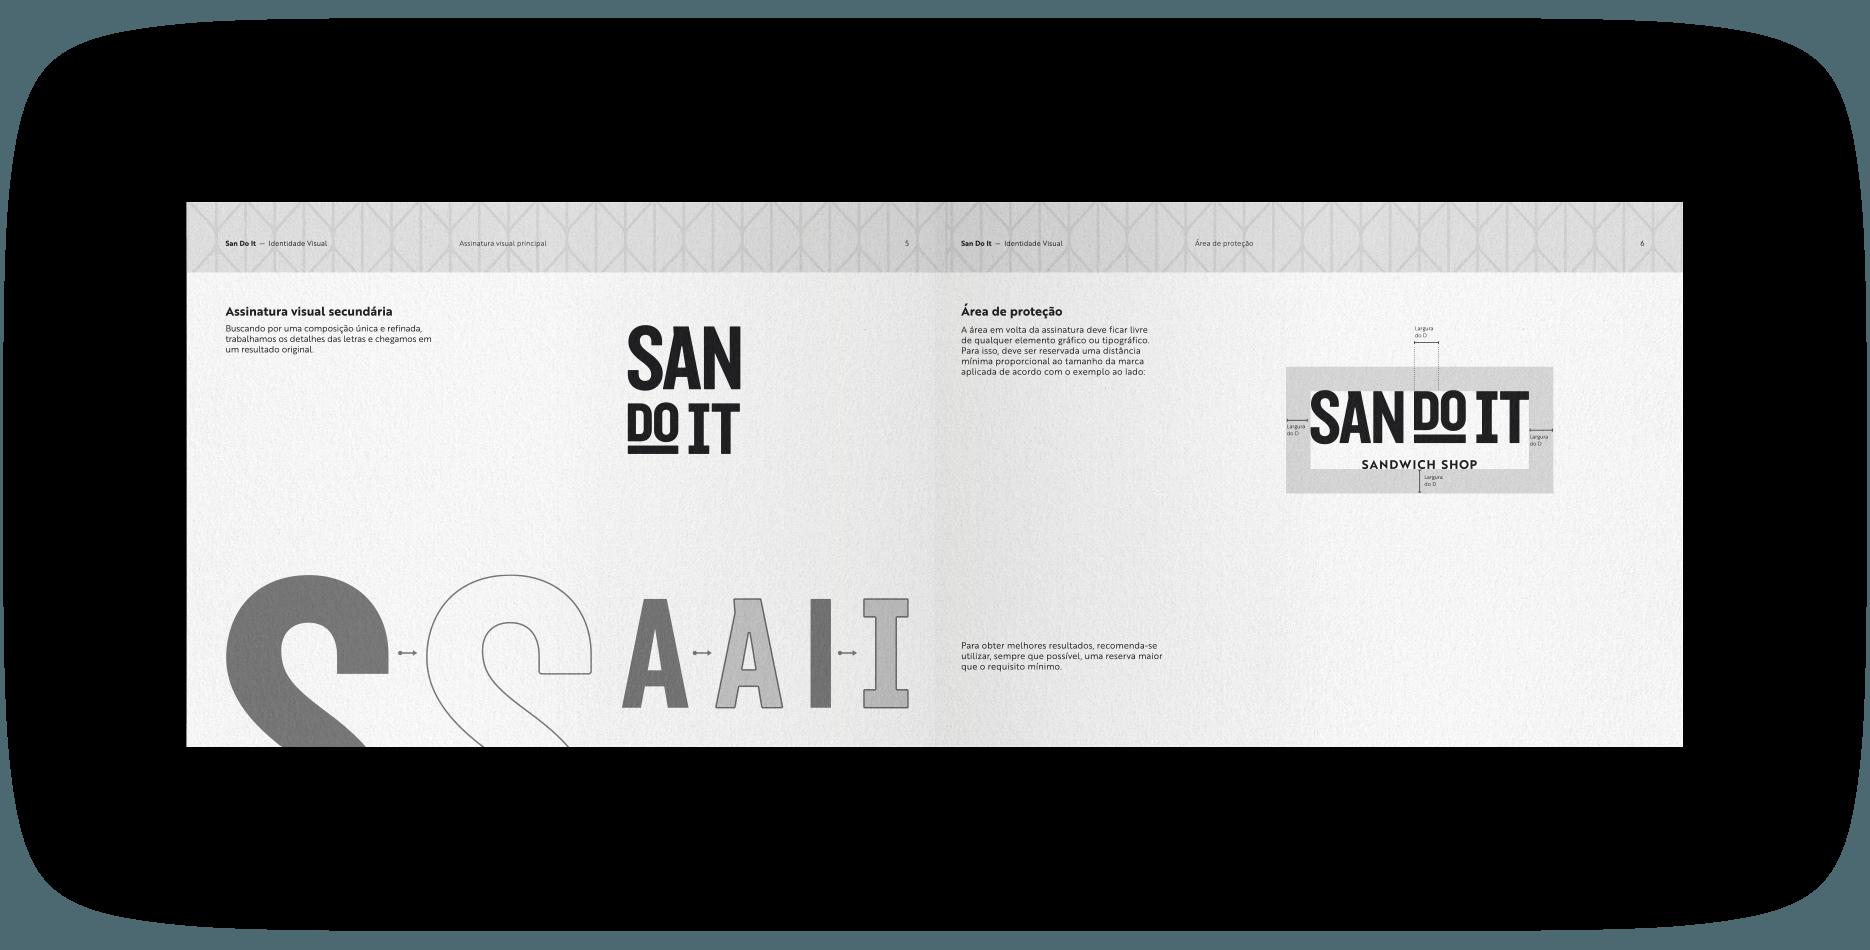 03-sandoit-strategy-brandbook